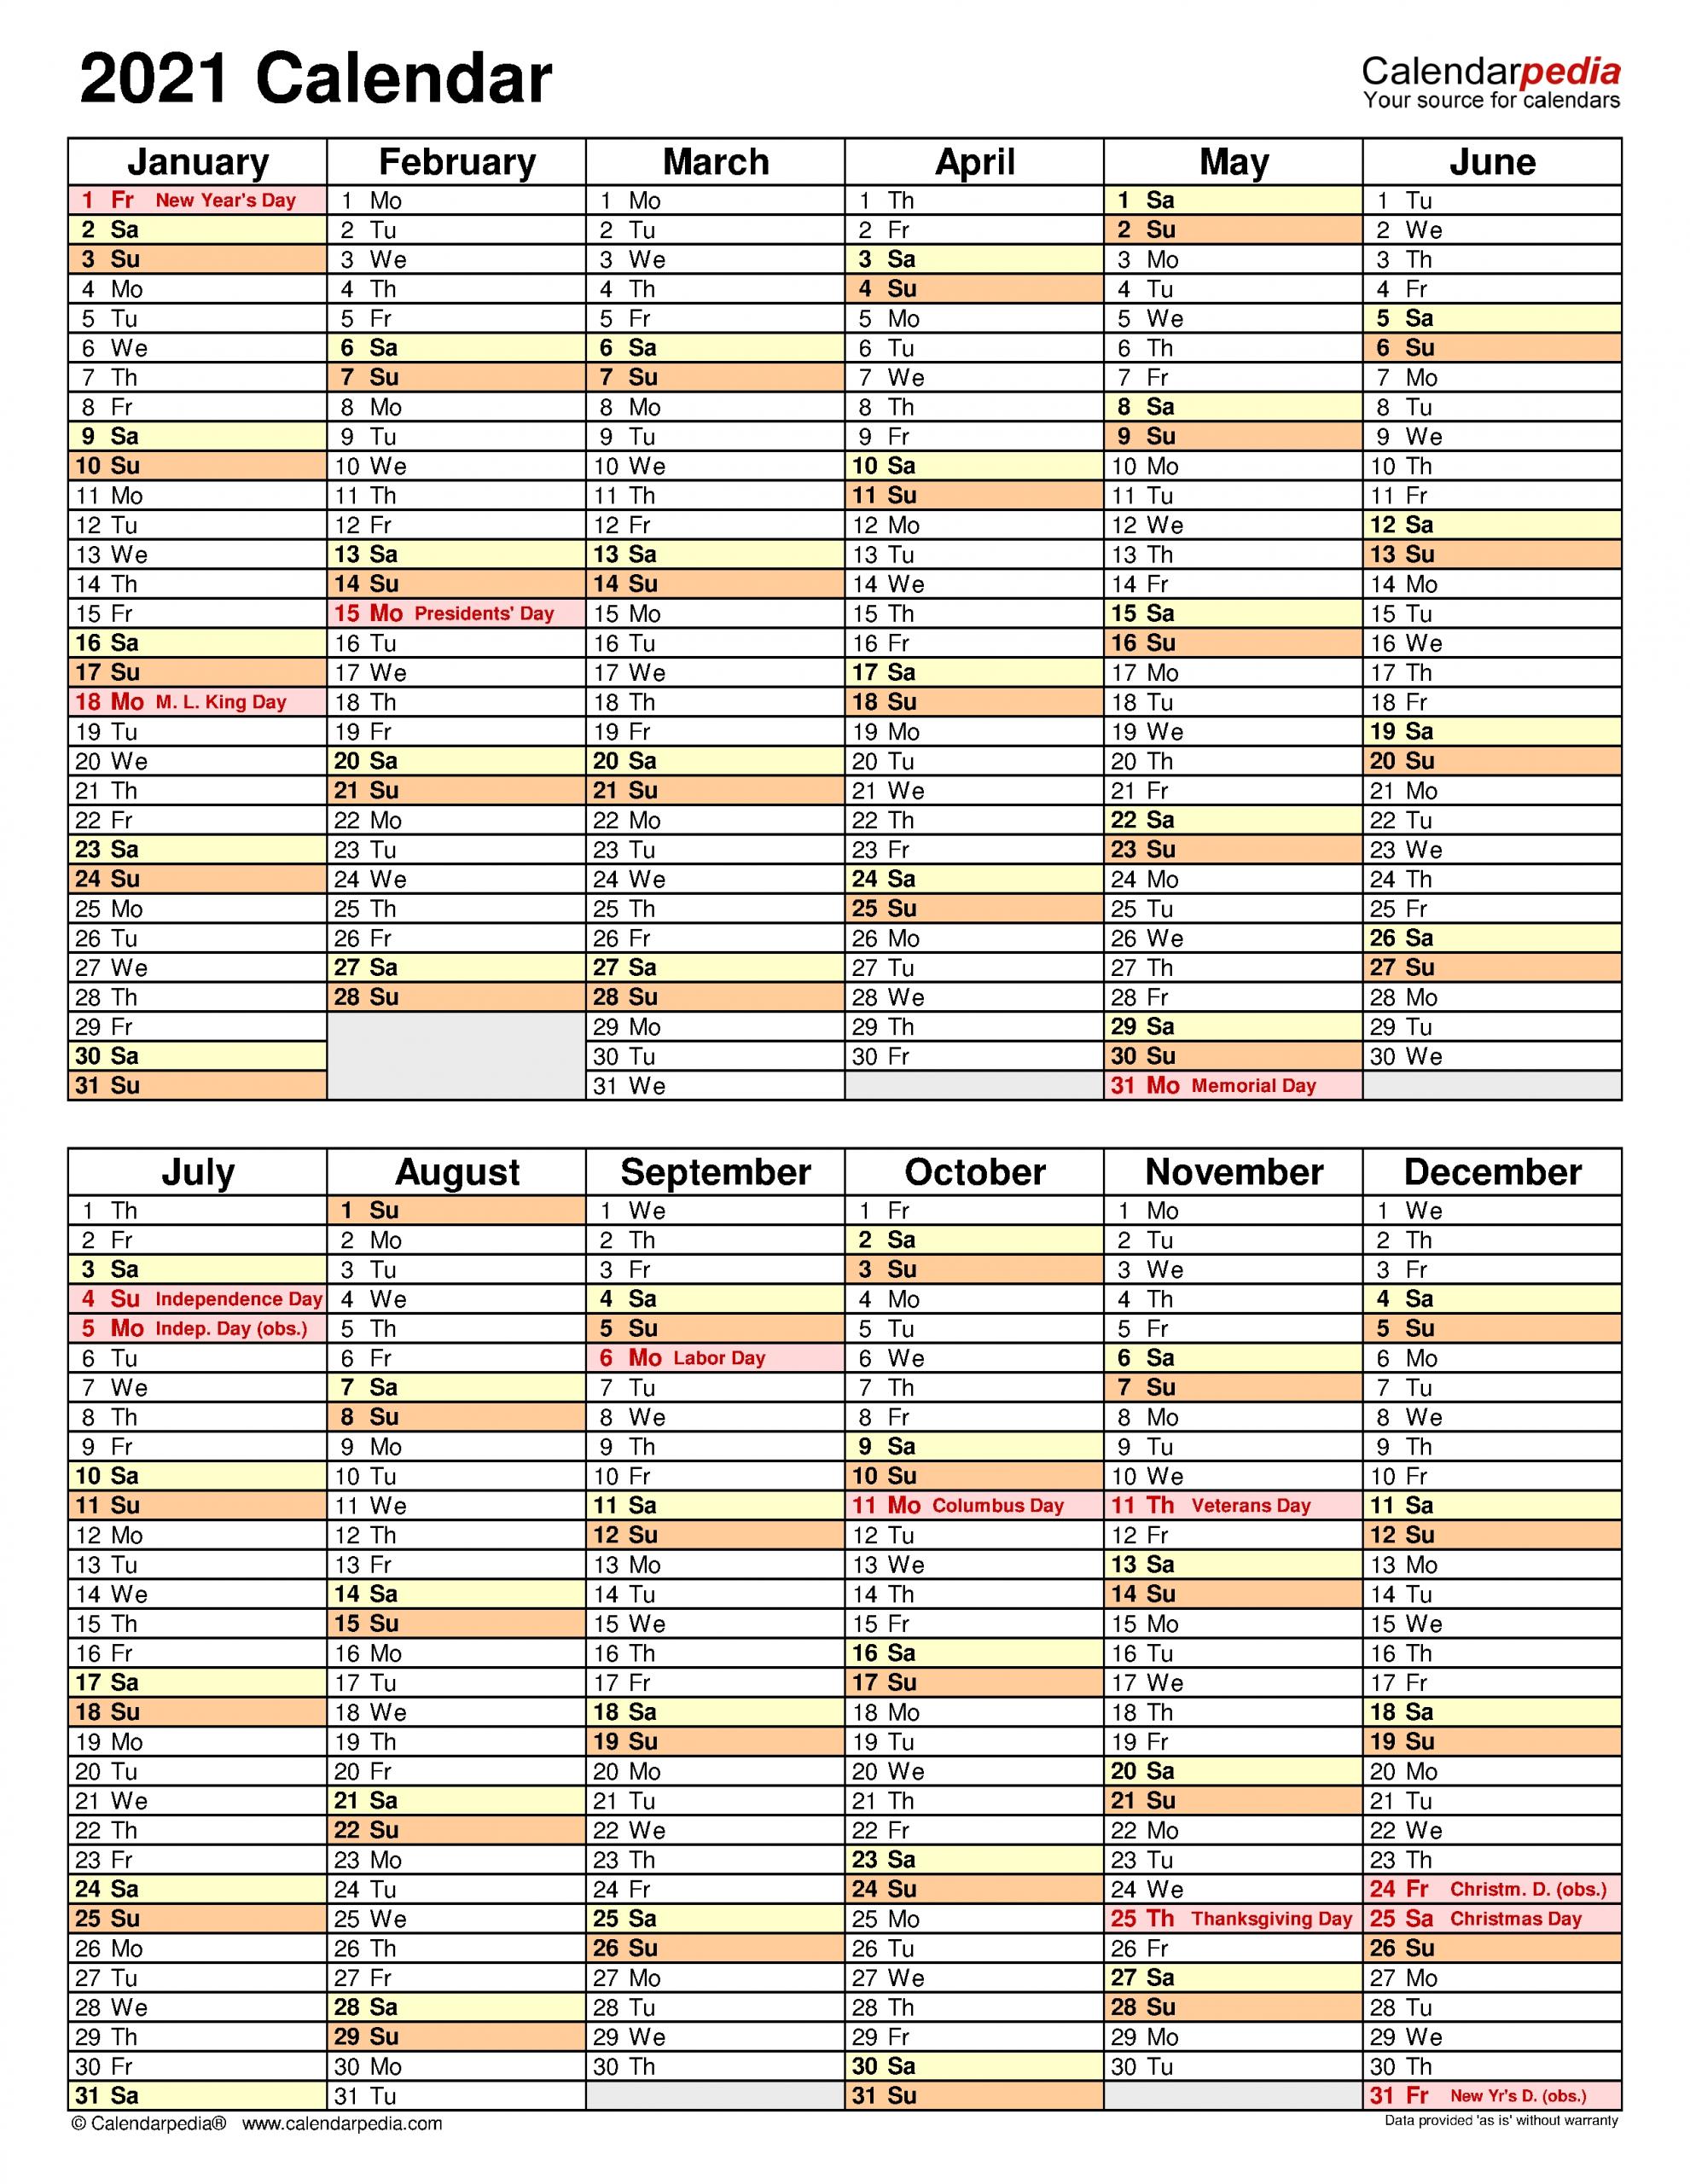 2021 Calendar - Free Printable Excel Templates - Calendarpedia with regard to Printable Calendars For 2021 Graphics